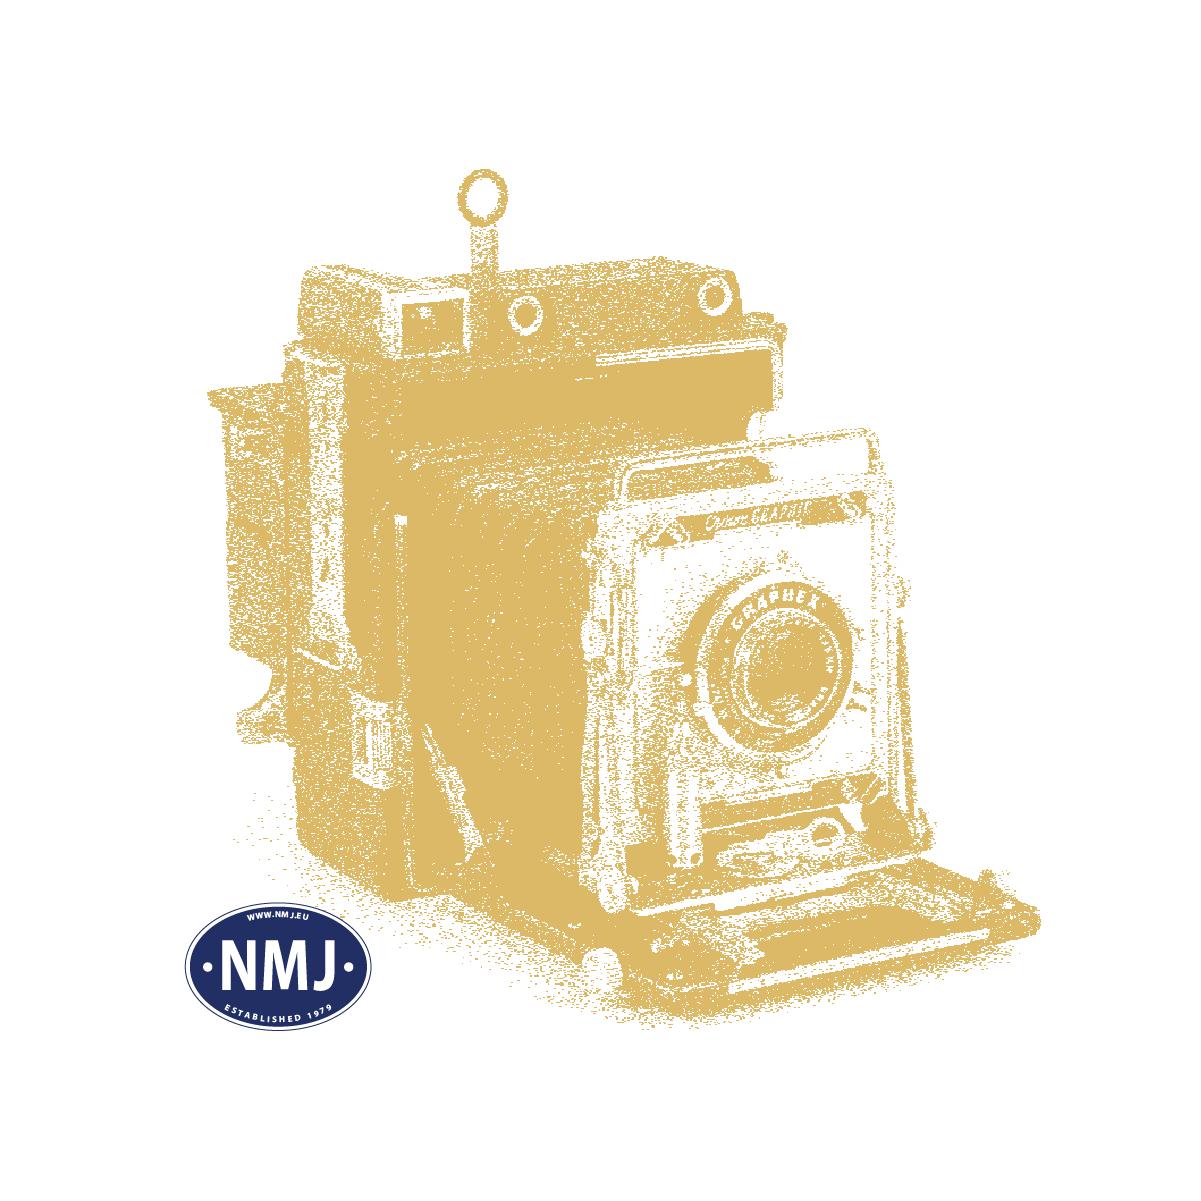 NMJT95302 - NMJ Topline CFL 1603 (1956-1971), AC m/Lyd (NMJT96302)